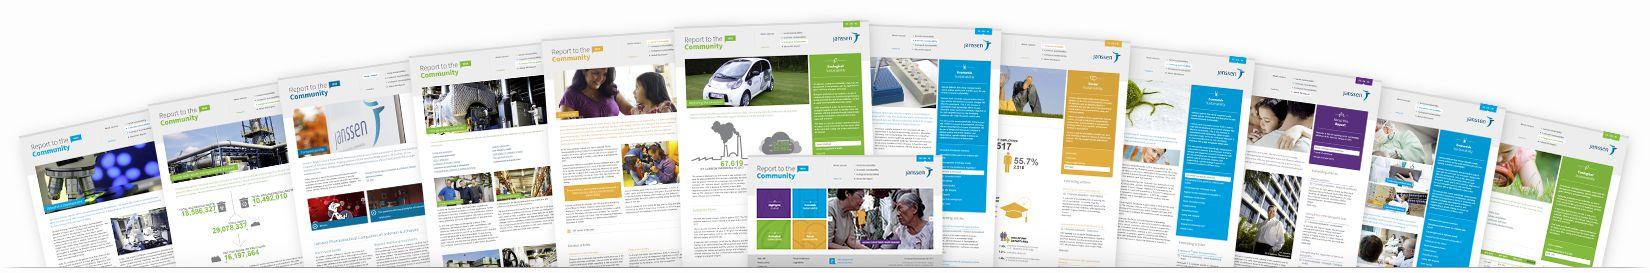 Janssen 2013 - website overzicht